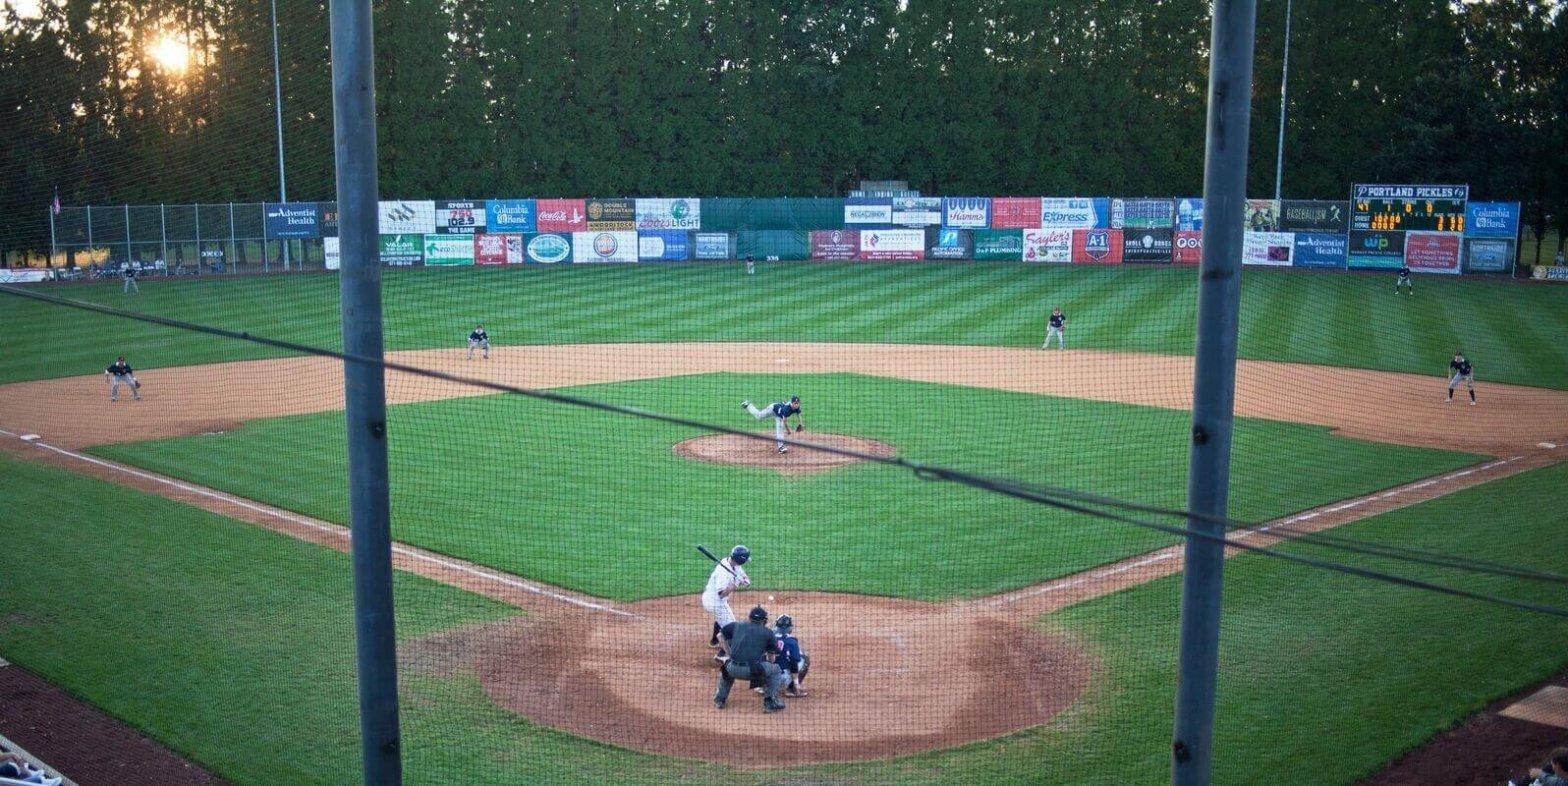 Christmas In July 2021 Omaha Baseball News West Coast League